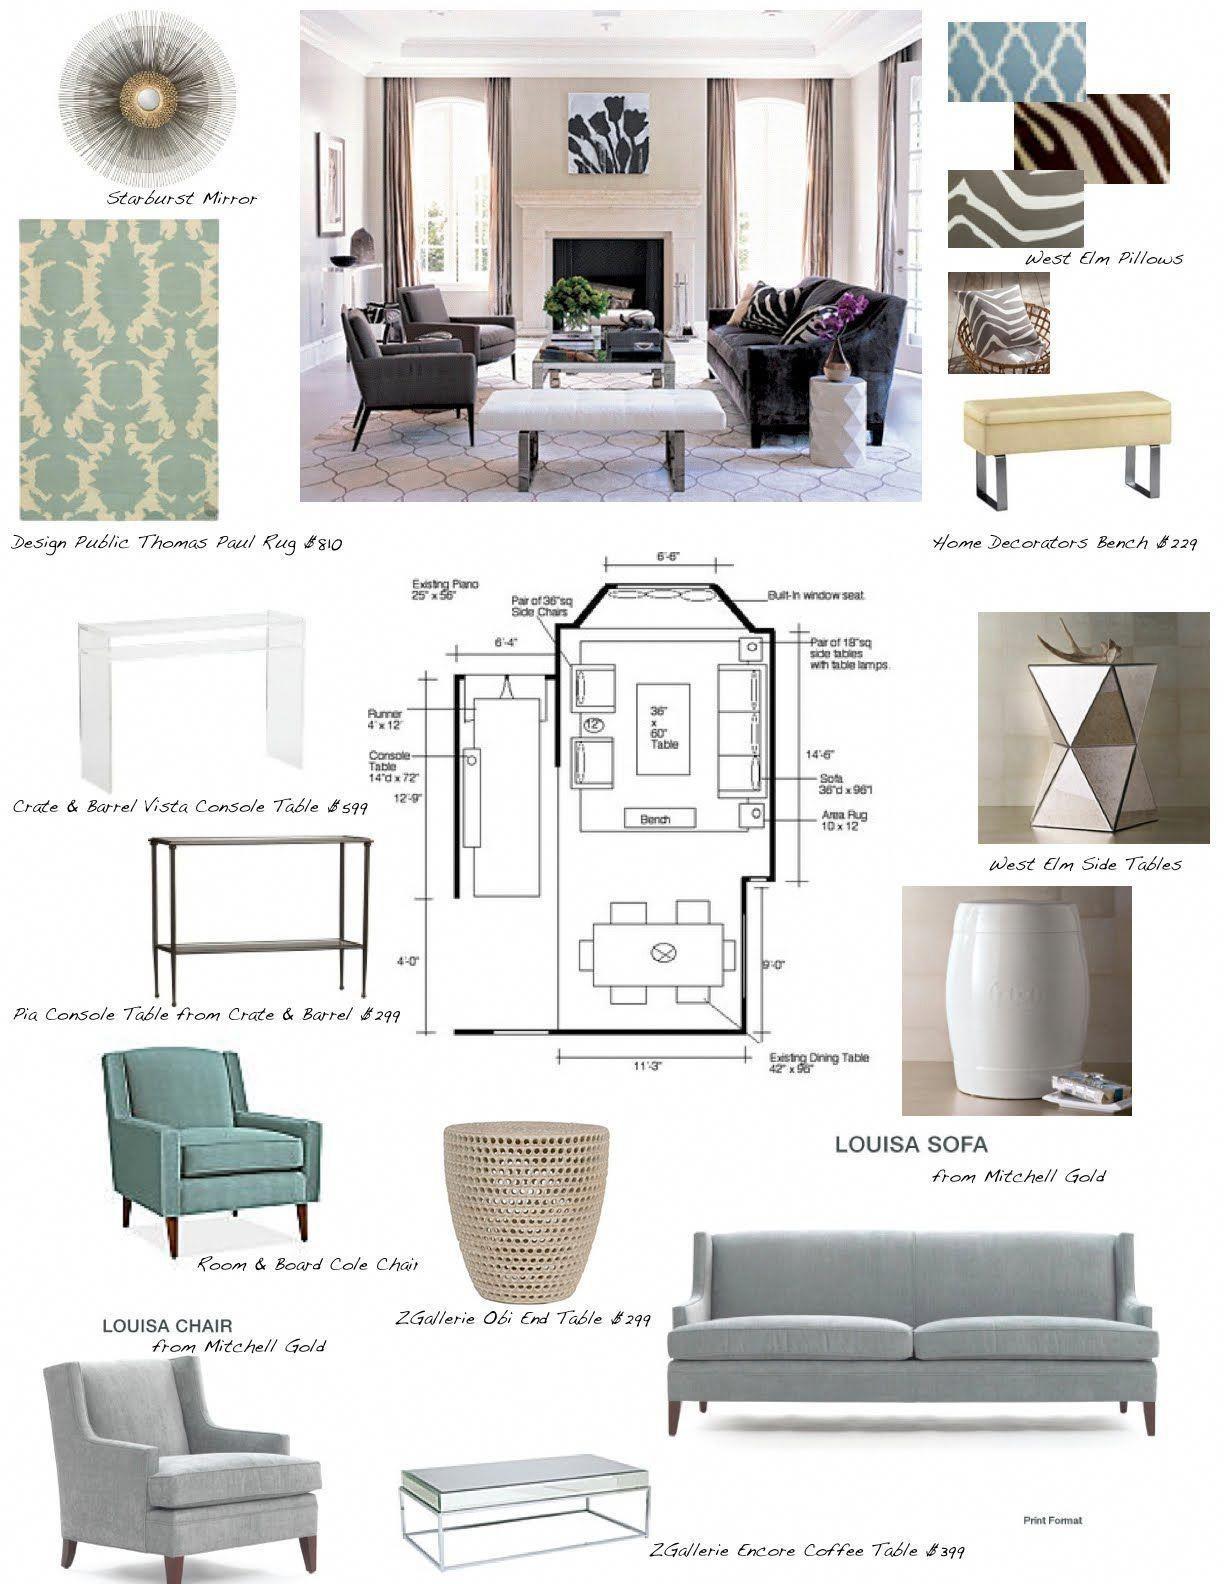 Home decorating stores dallas bedroomdecoratingideas also interior design courses bridgetkbergstrom on pinterest rh